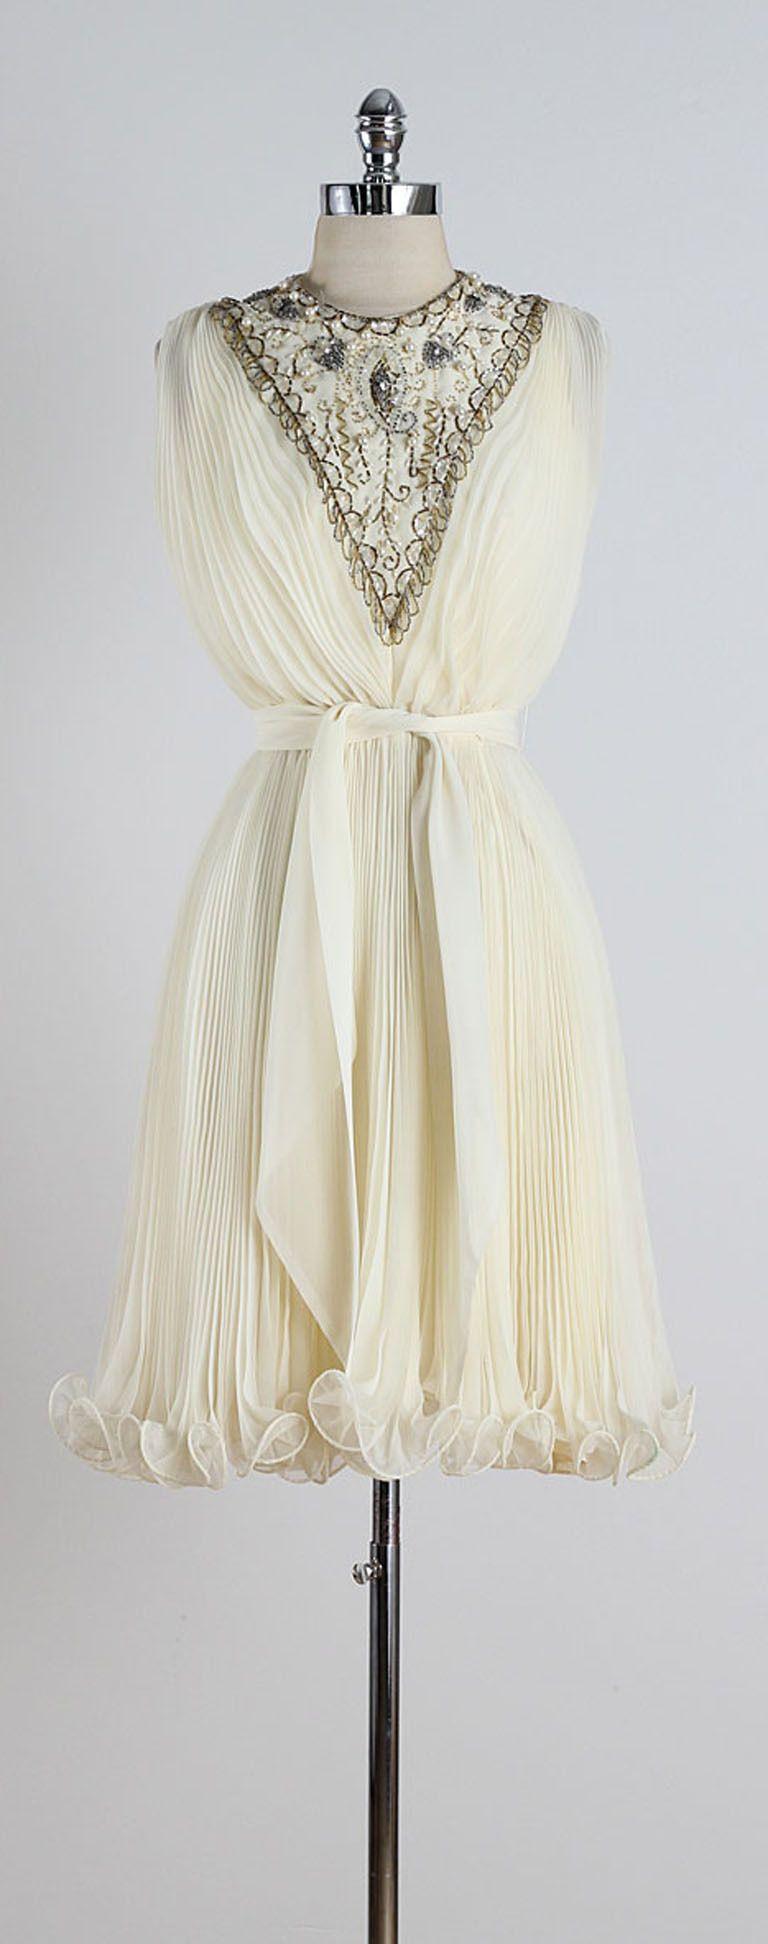 1960s Jack Bryan Jeweled Bib Cocktail Dress 1stdibs Com Vintage Fashion 1960s Fashion Vintage Fashion [ 1944 x 768 Pixel ]